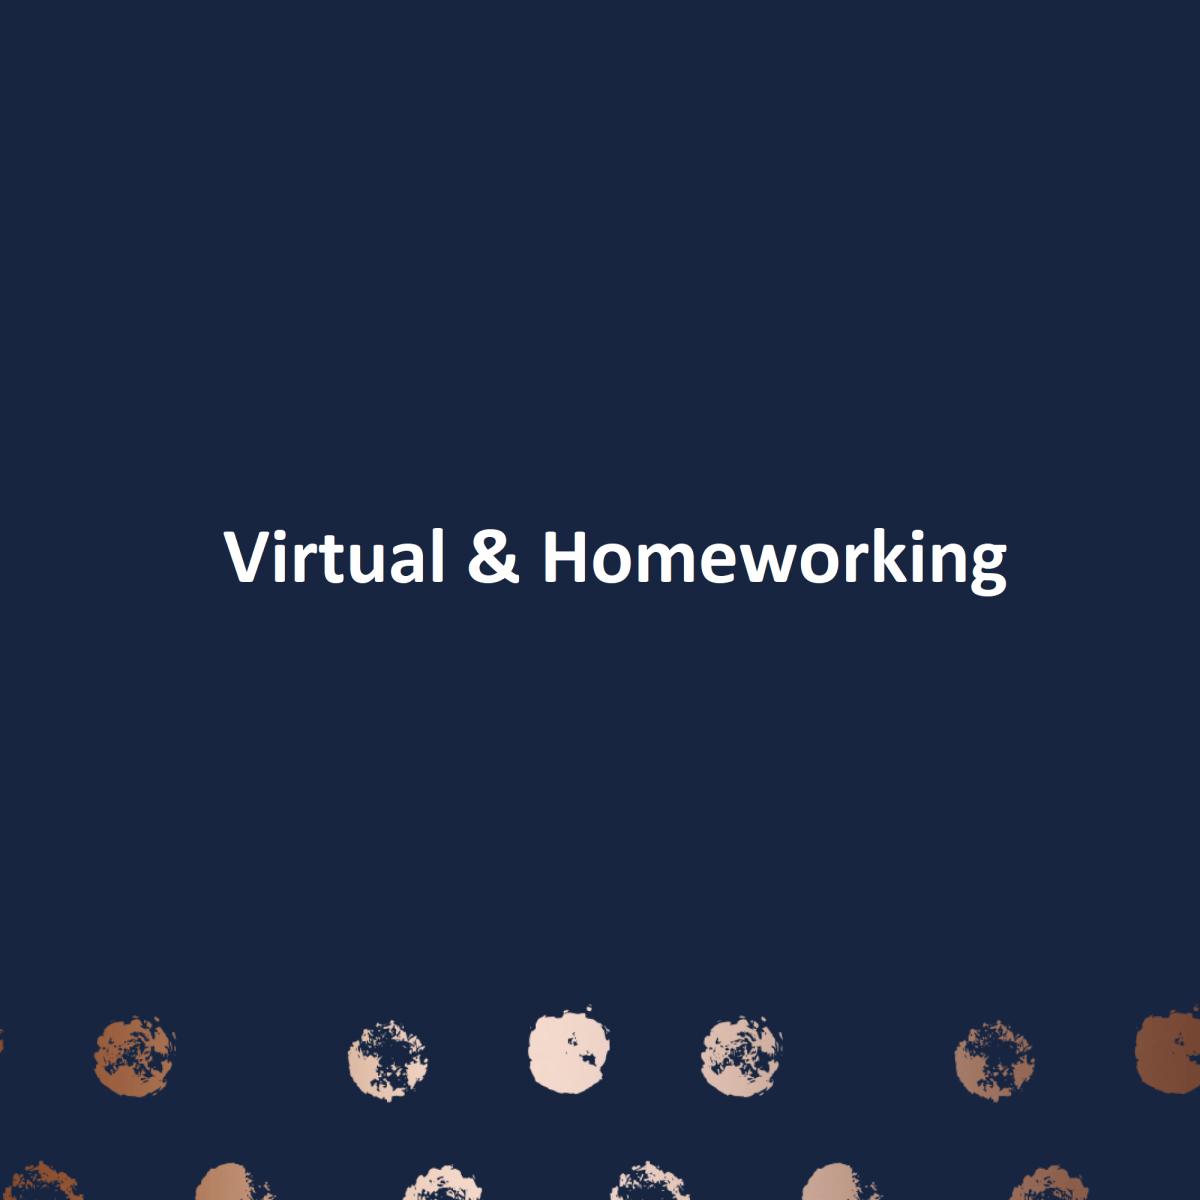 Virtual & Homeworking